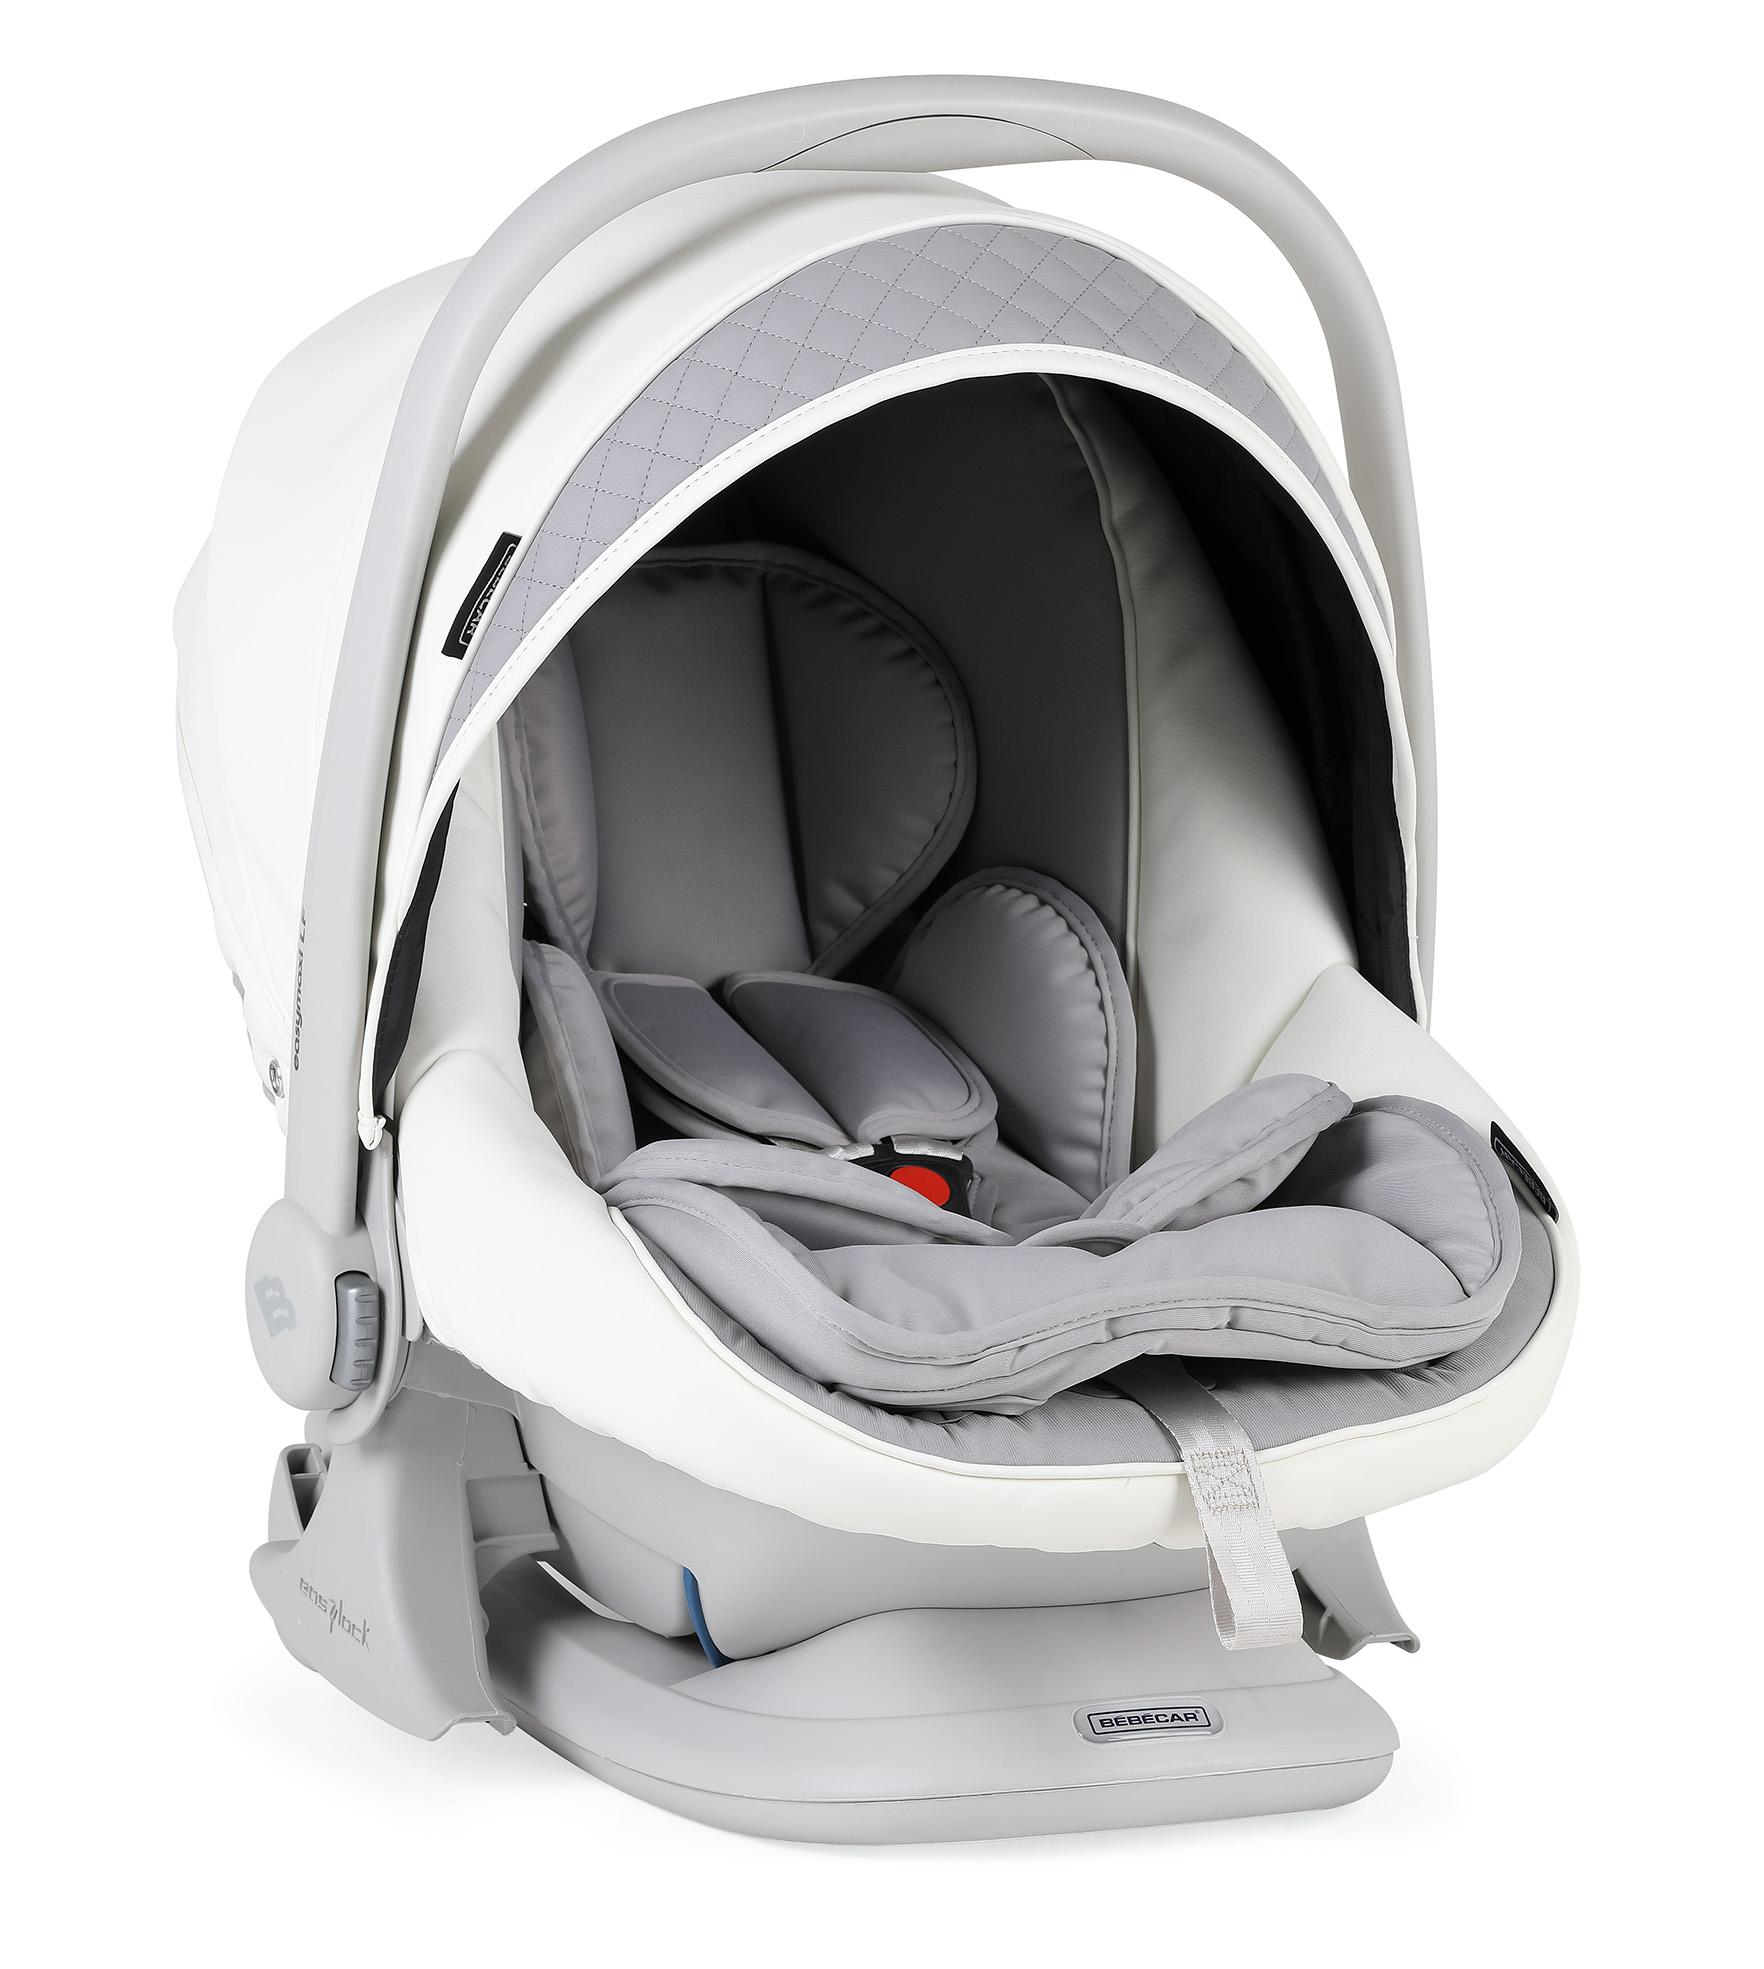 bebecar ip-op dove grey car seat